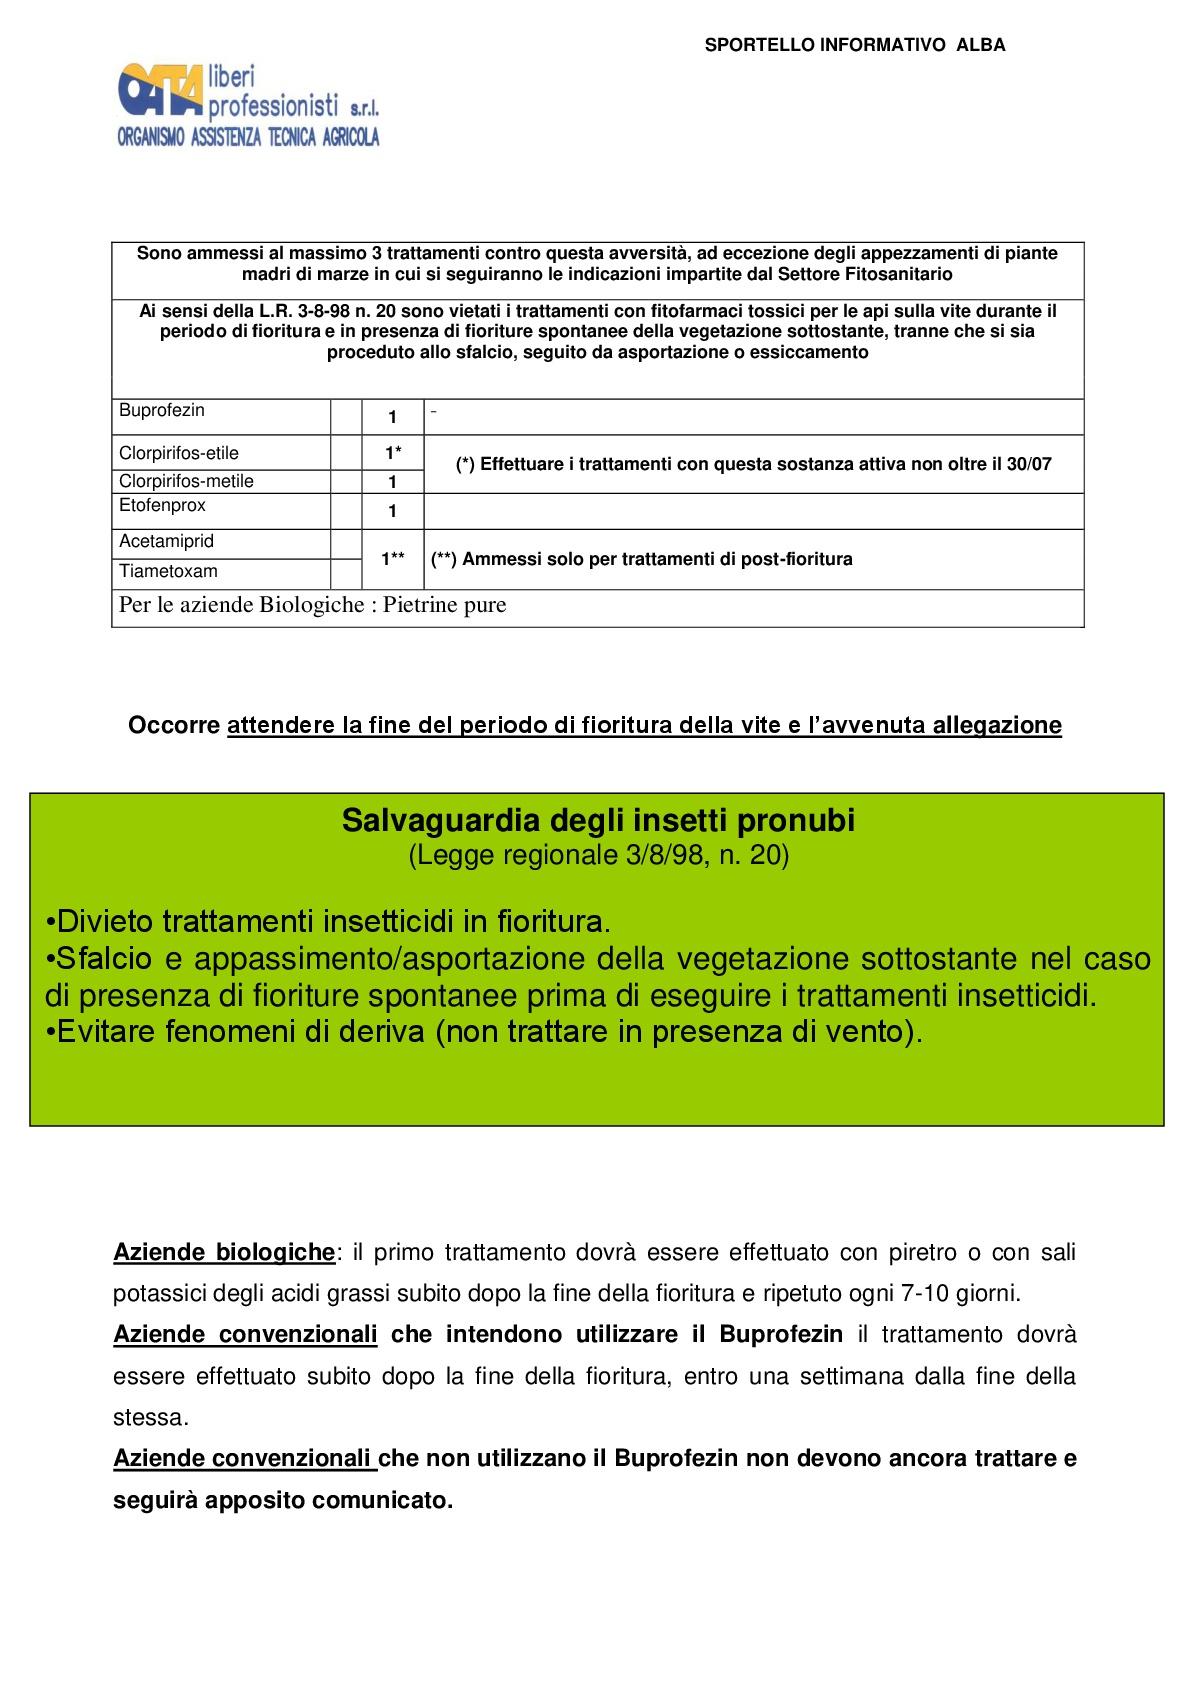 bollettino-vite-5-2017-002